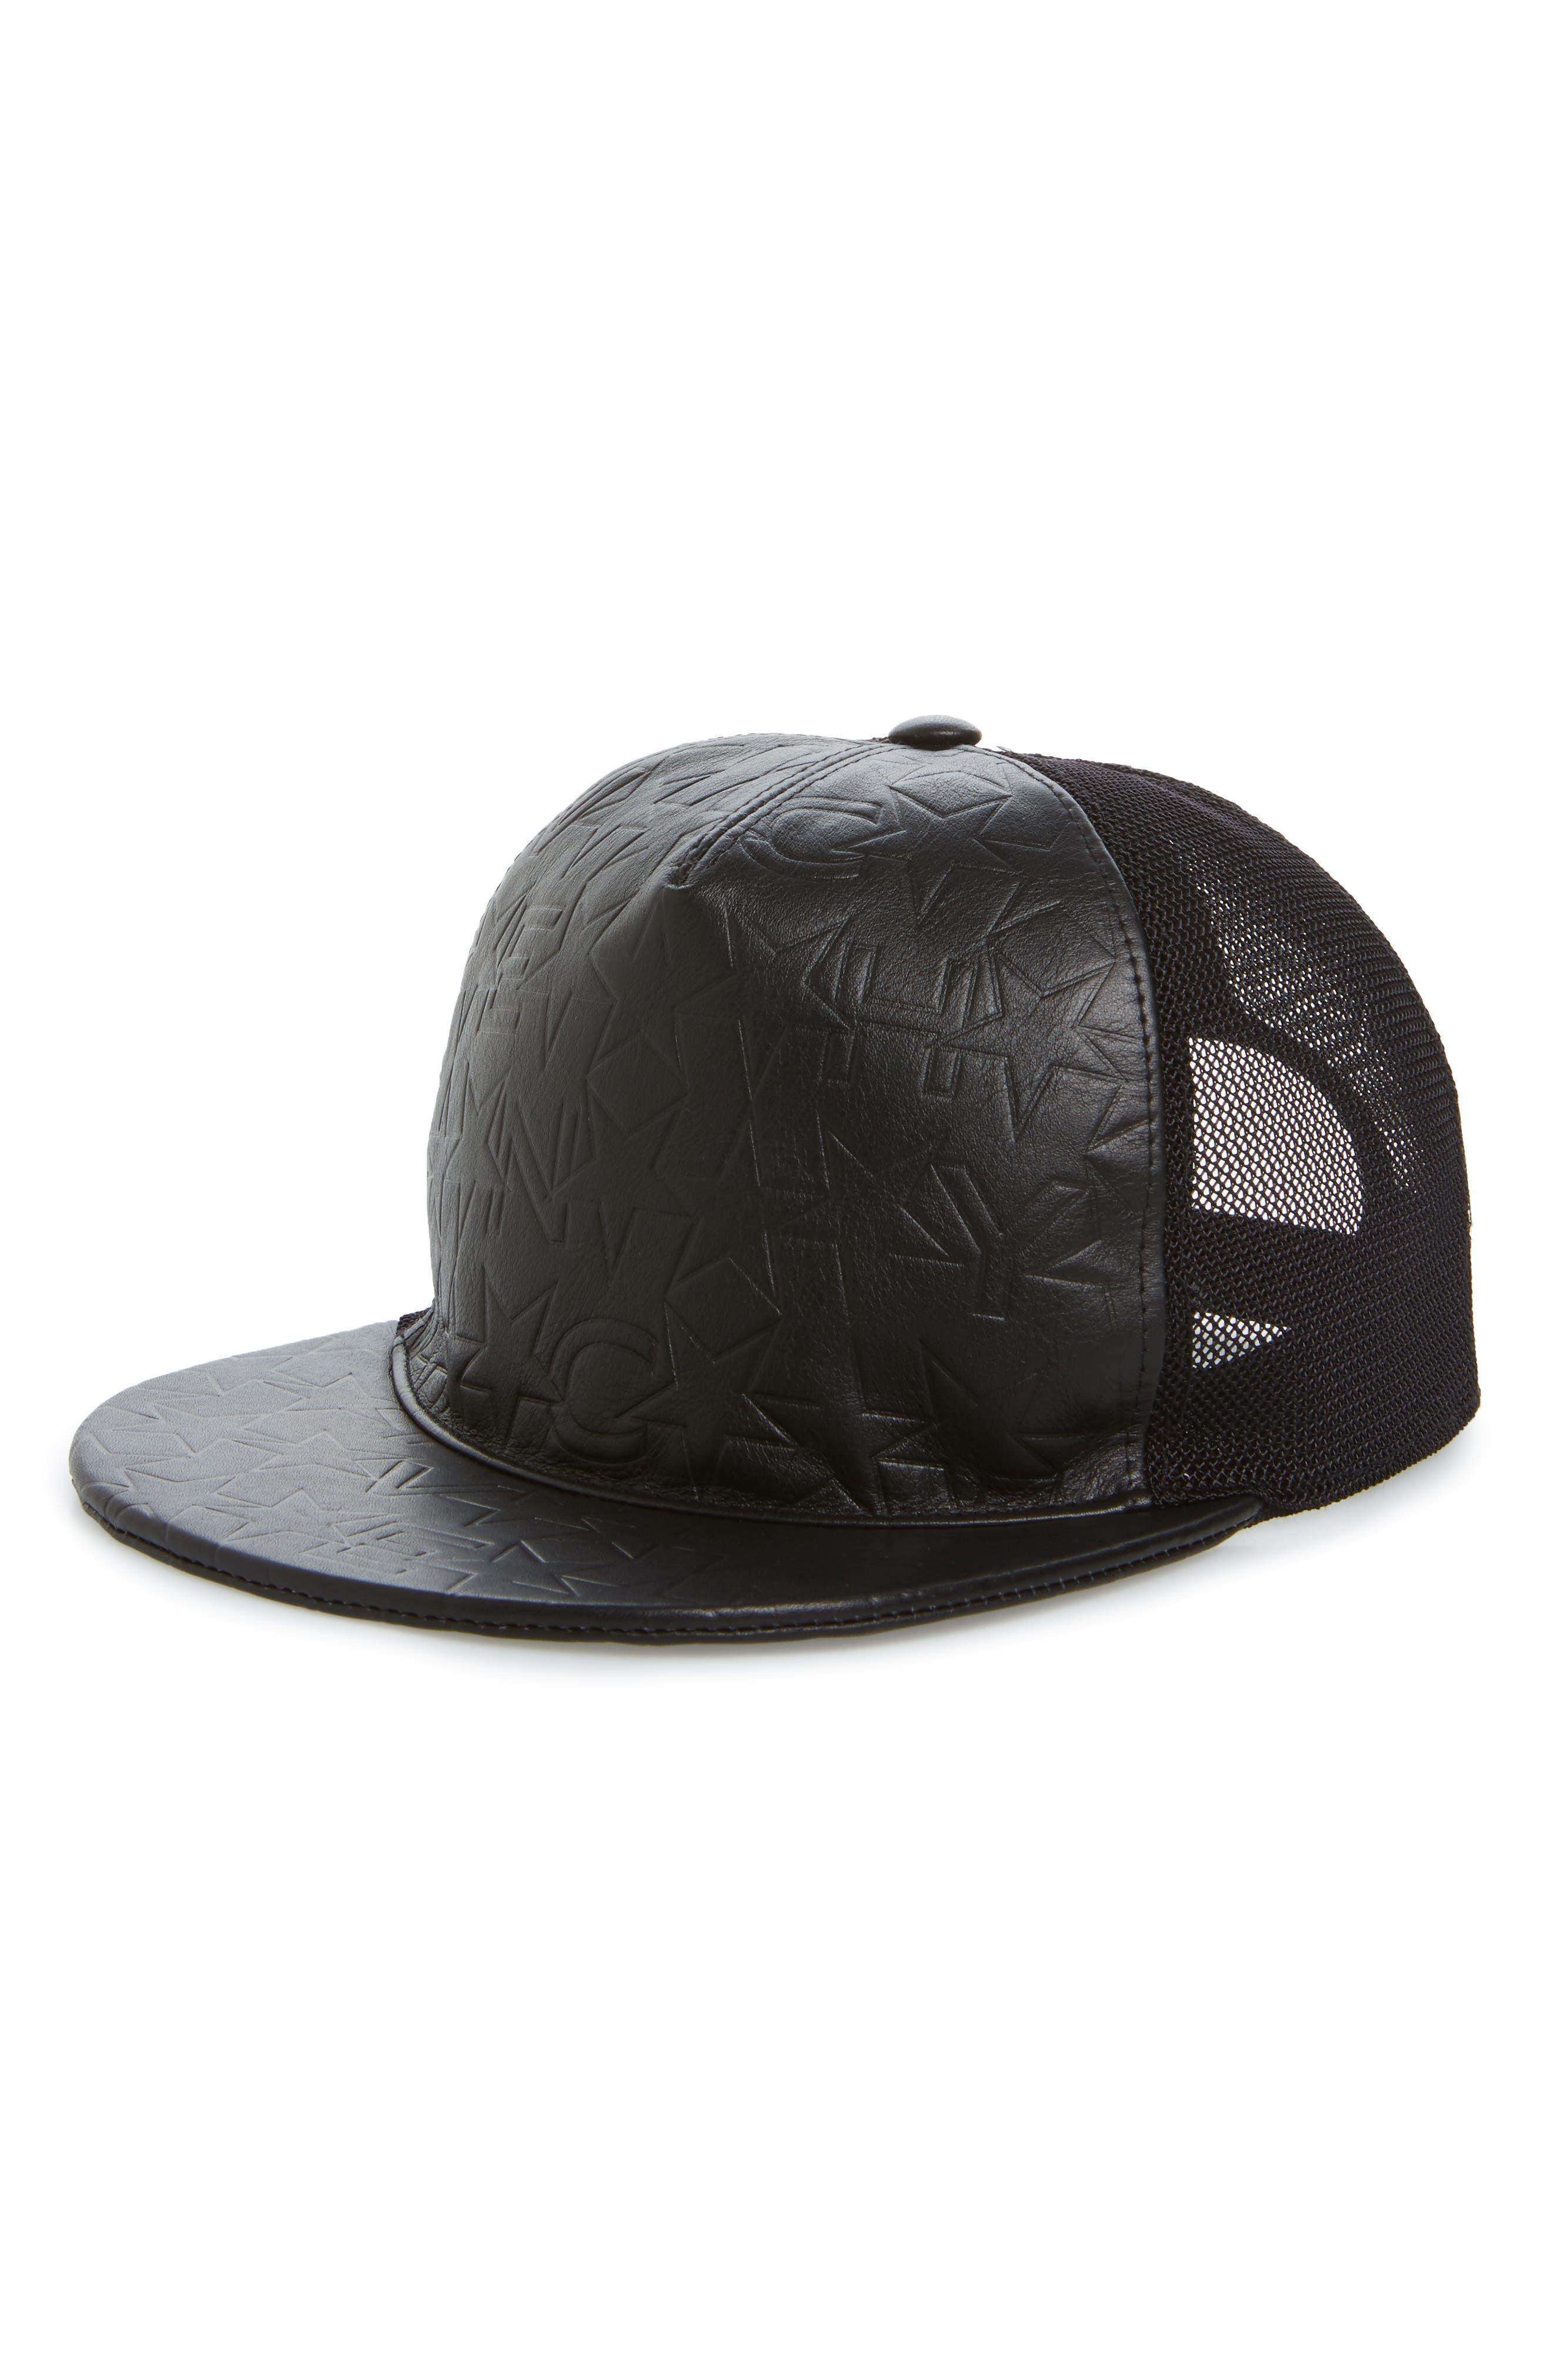 Main Image - Givenchy Trucker Hat